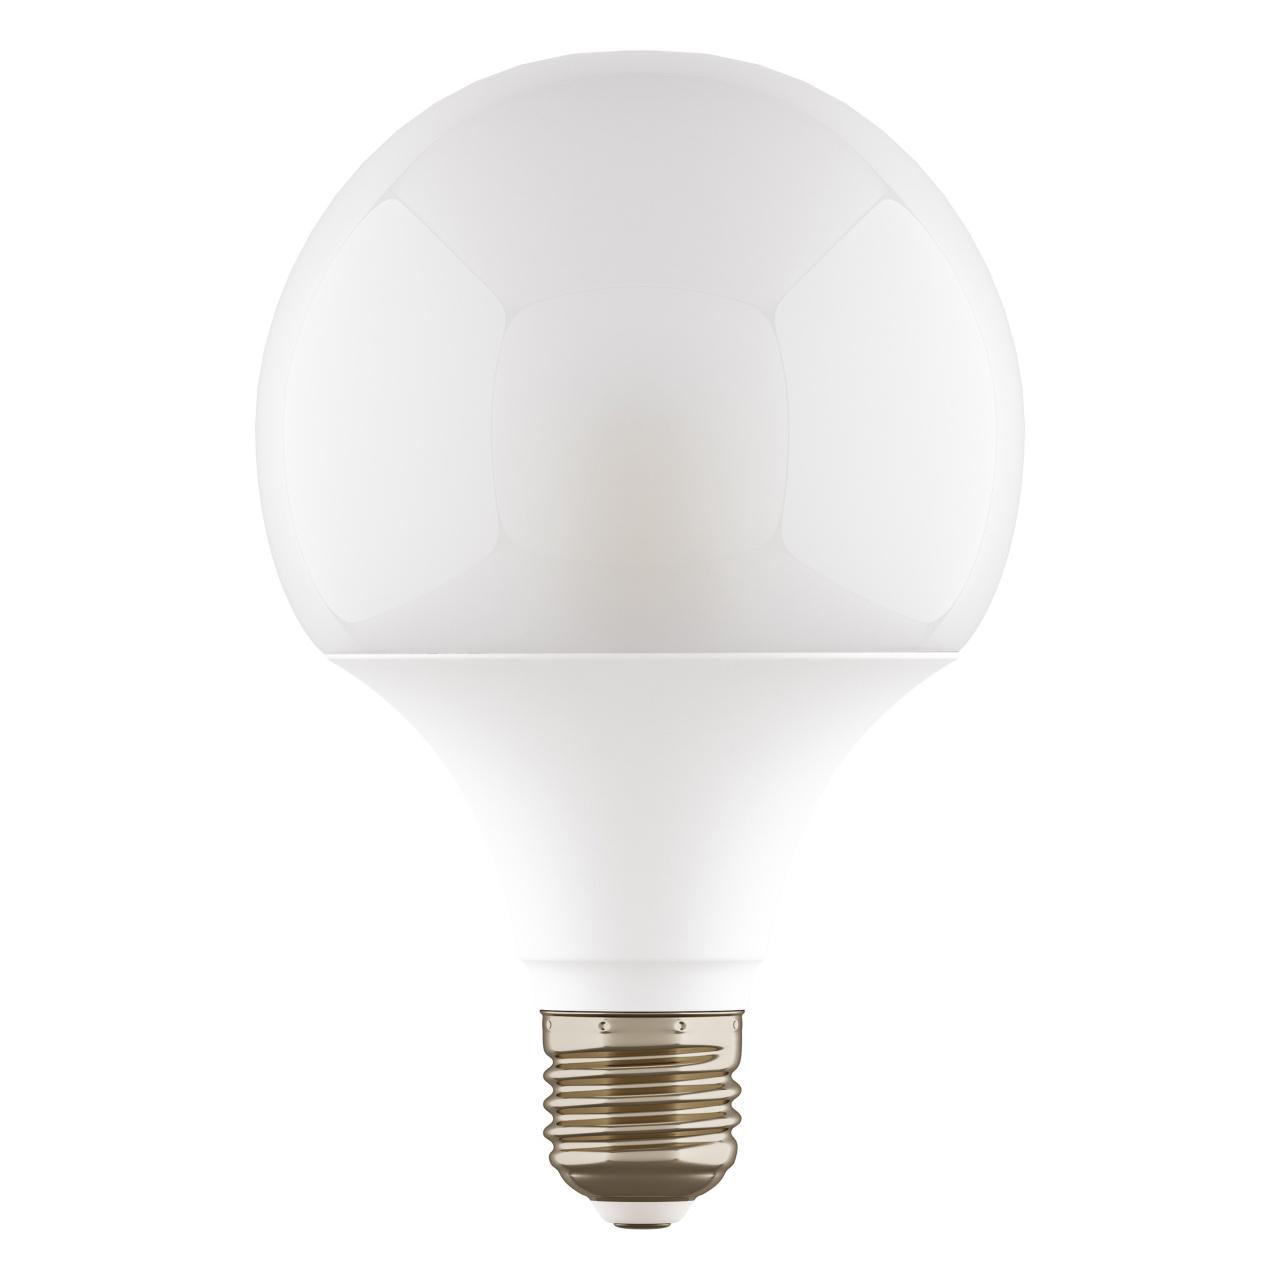 Лампа LED 220V G95 E27 12W=120W 1100LM 180G WH 4000K 20000H DIMM Lightstar 931304